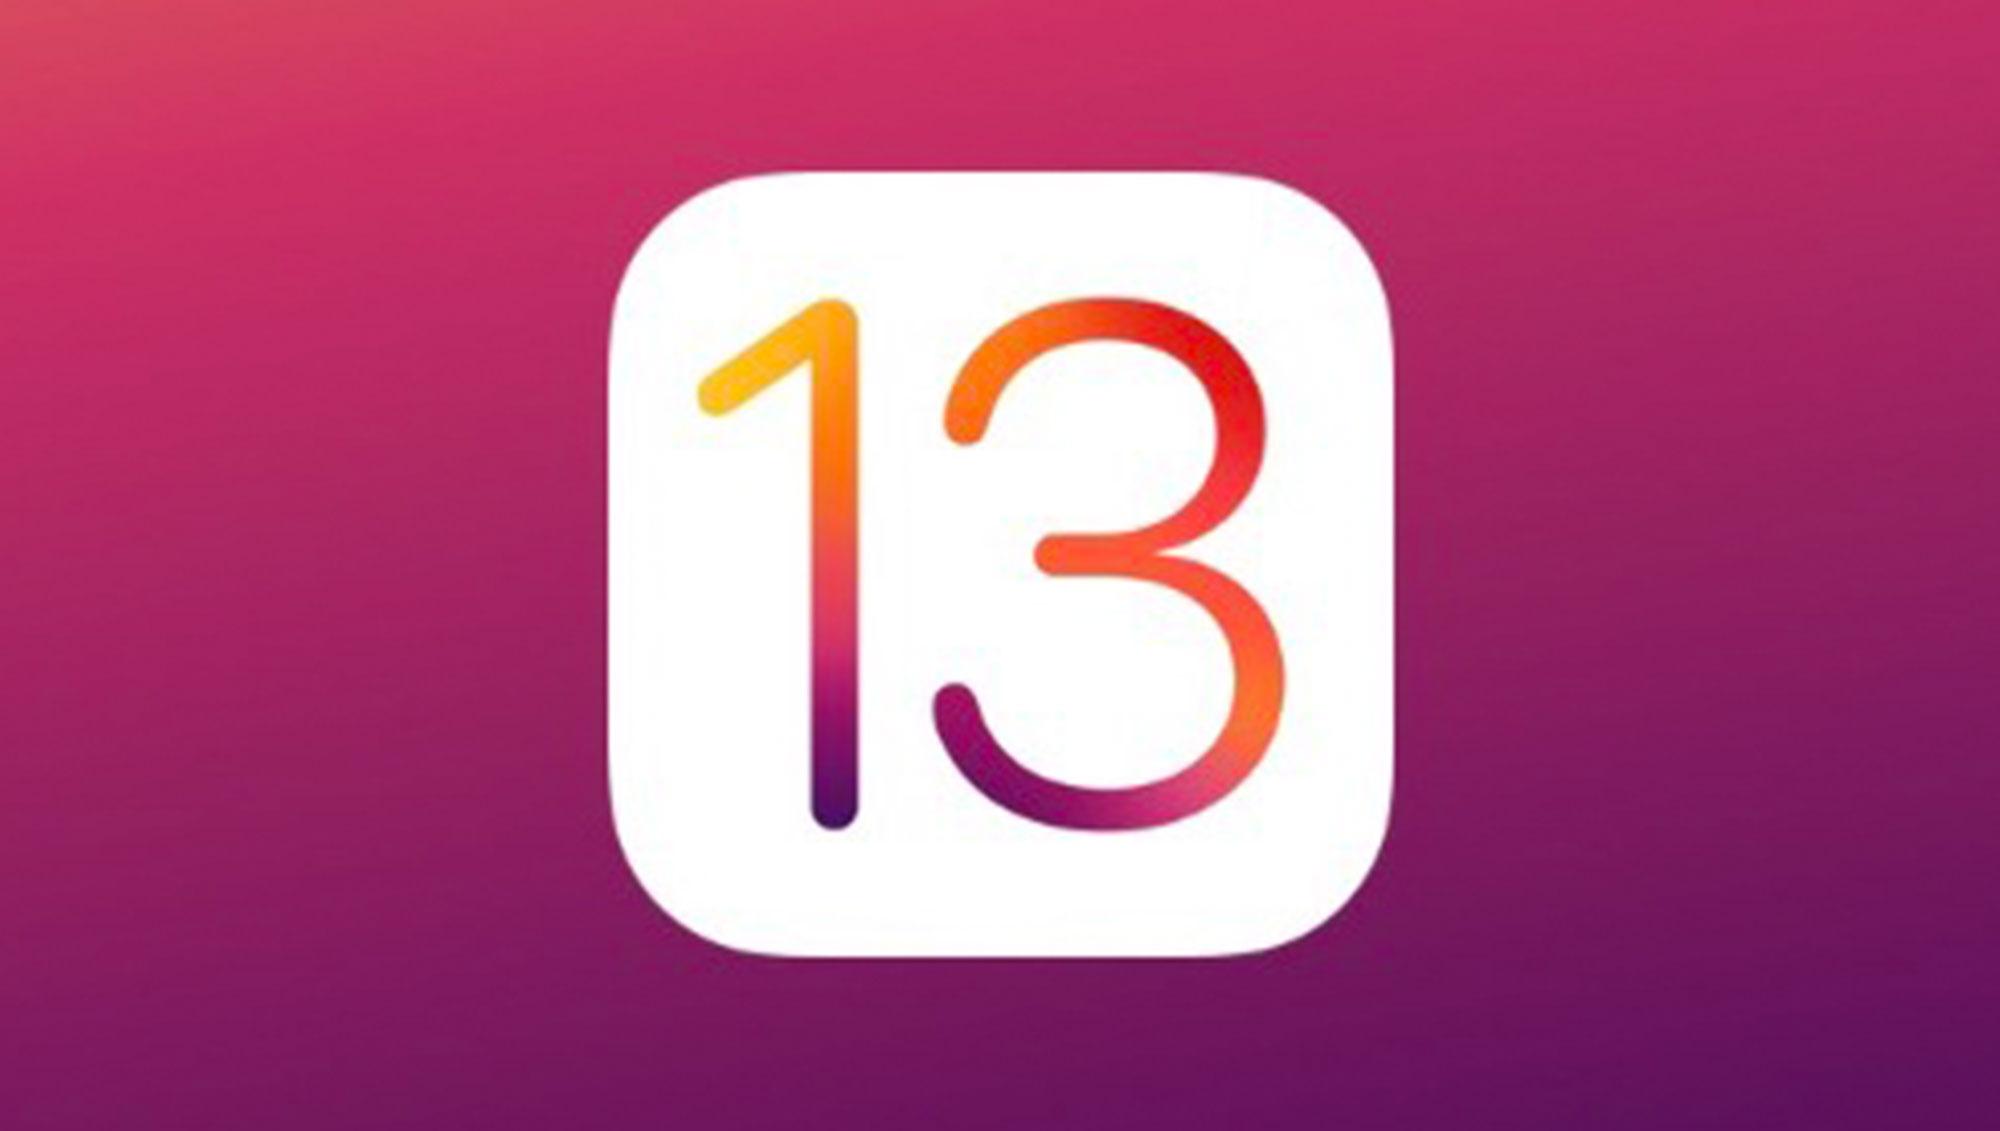 iOS 13公测版Beta 1提前推送  升级iOS 13 公测版教程